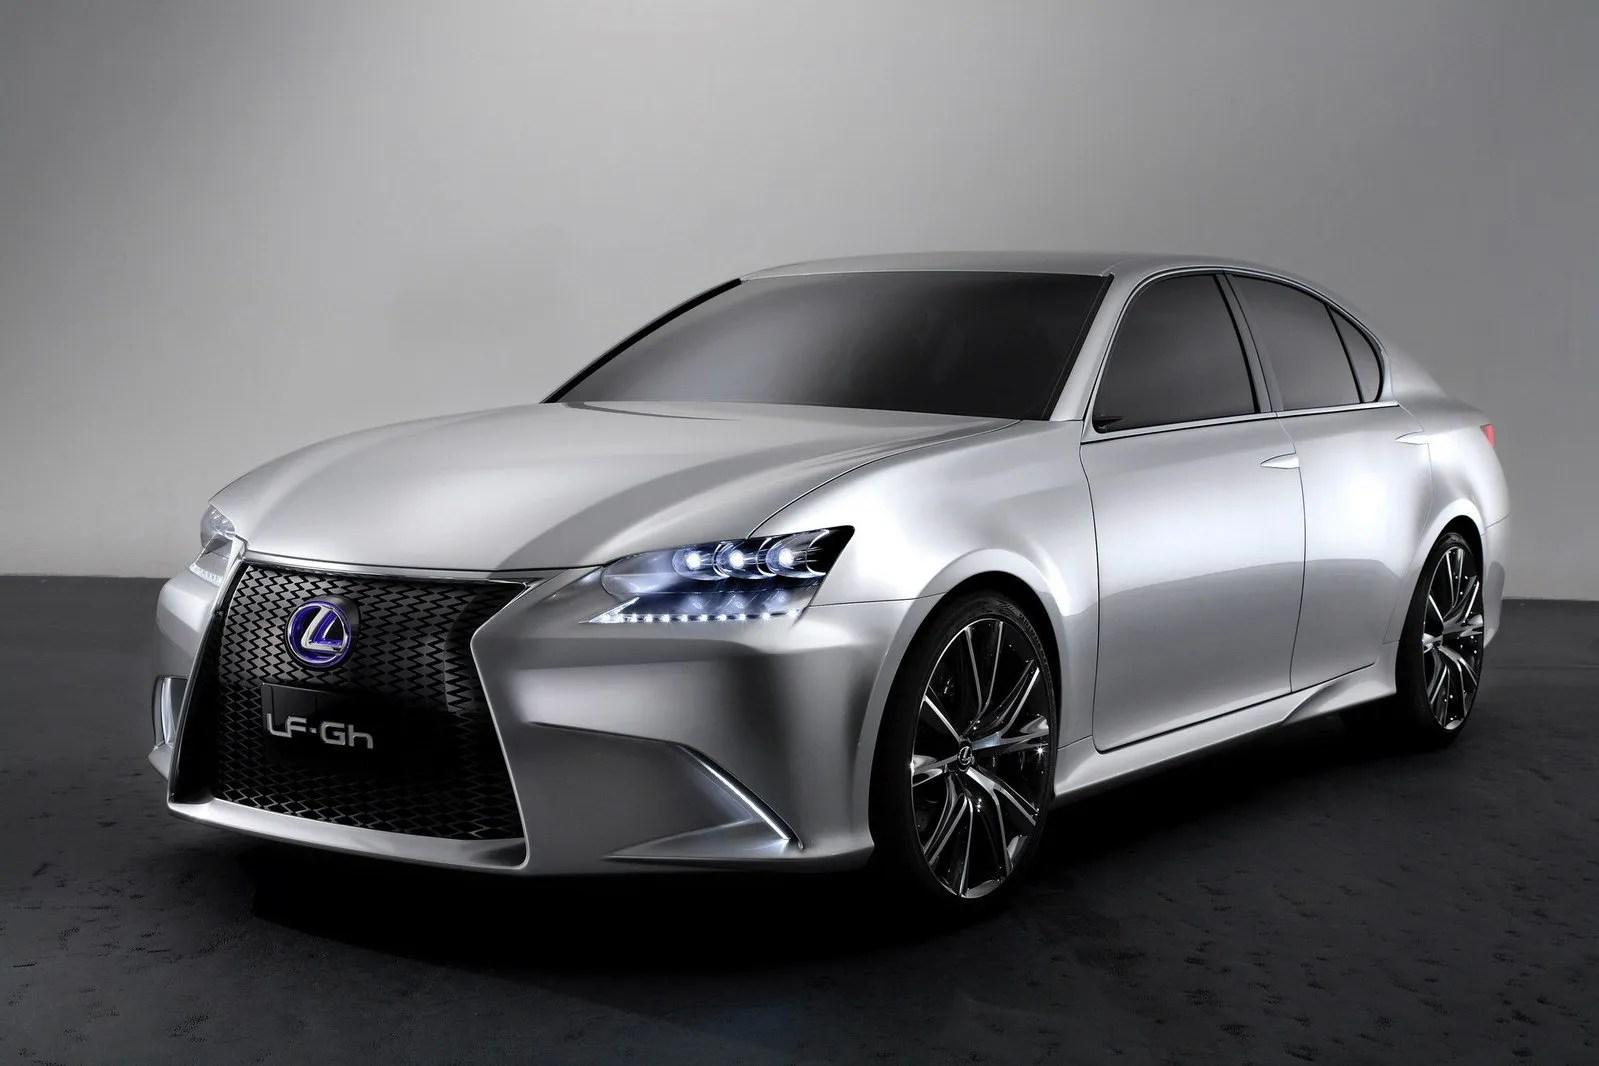 Wallpaper Muscle Car Hd 2011 Lexus Lf Gh Concept Review Top Speed